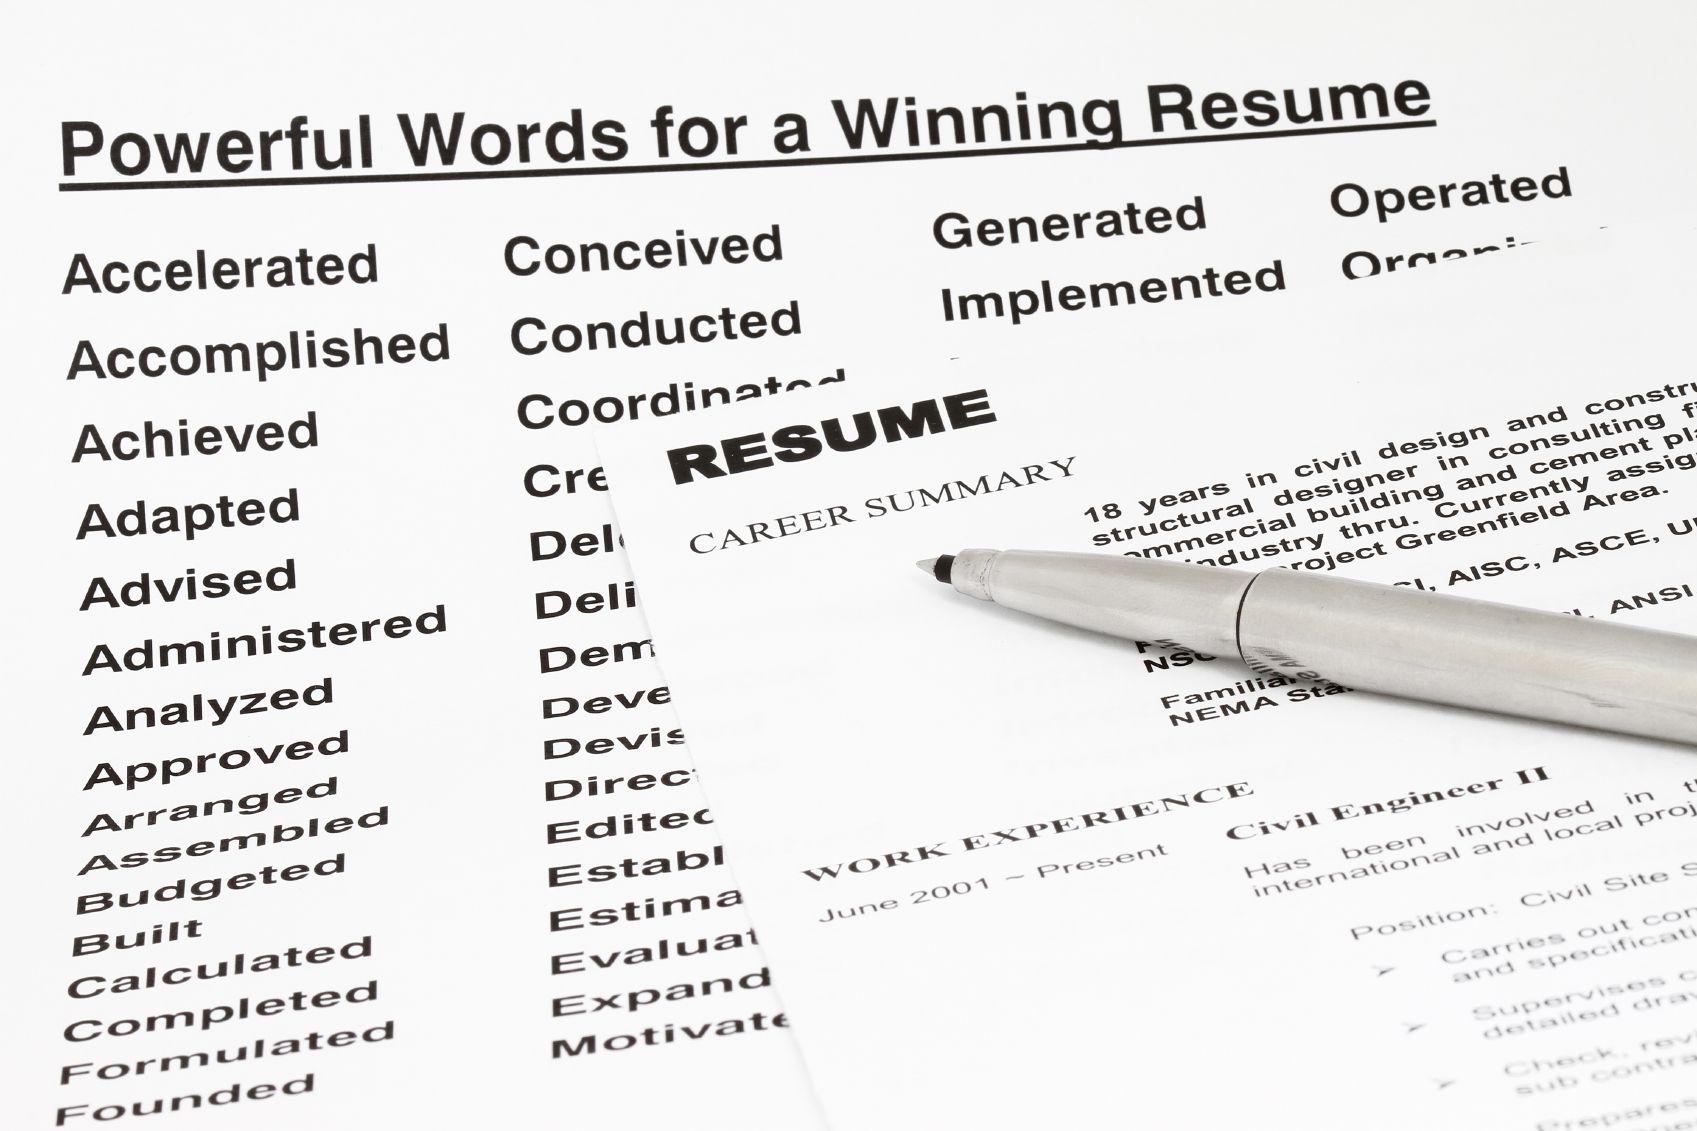 resume keywords for sales jobs